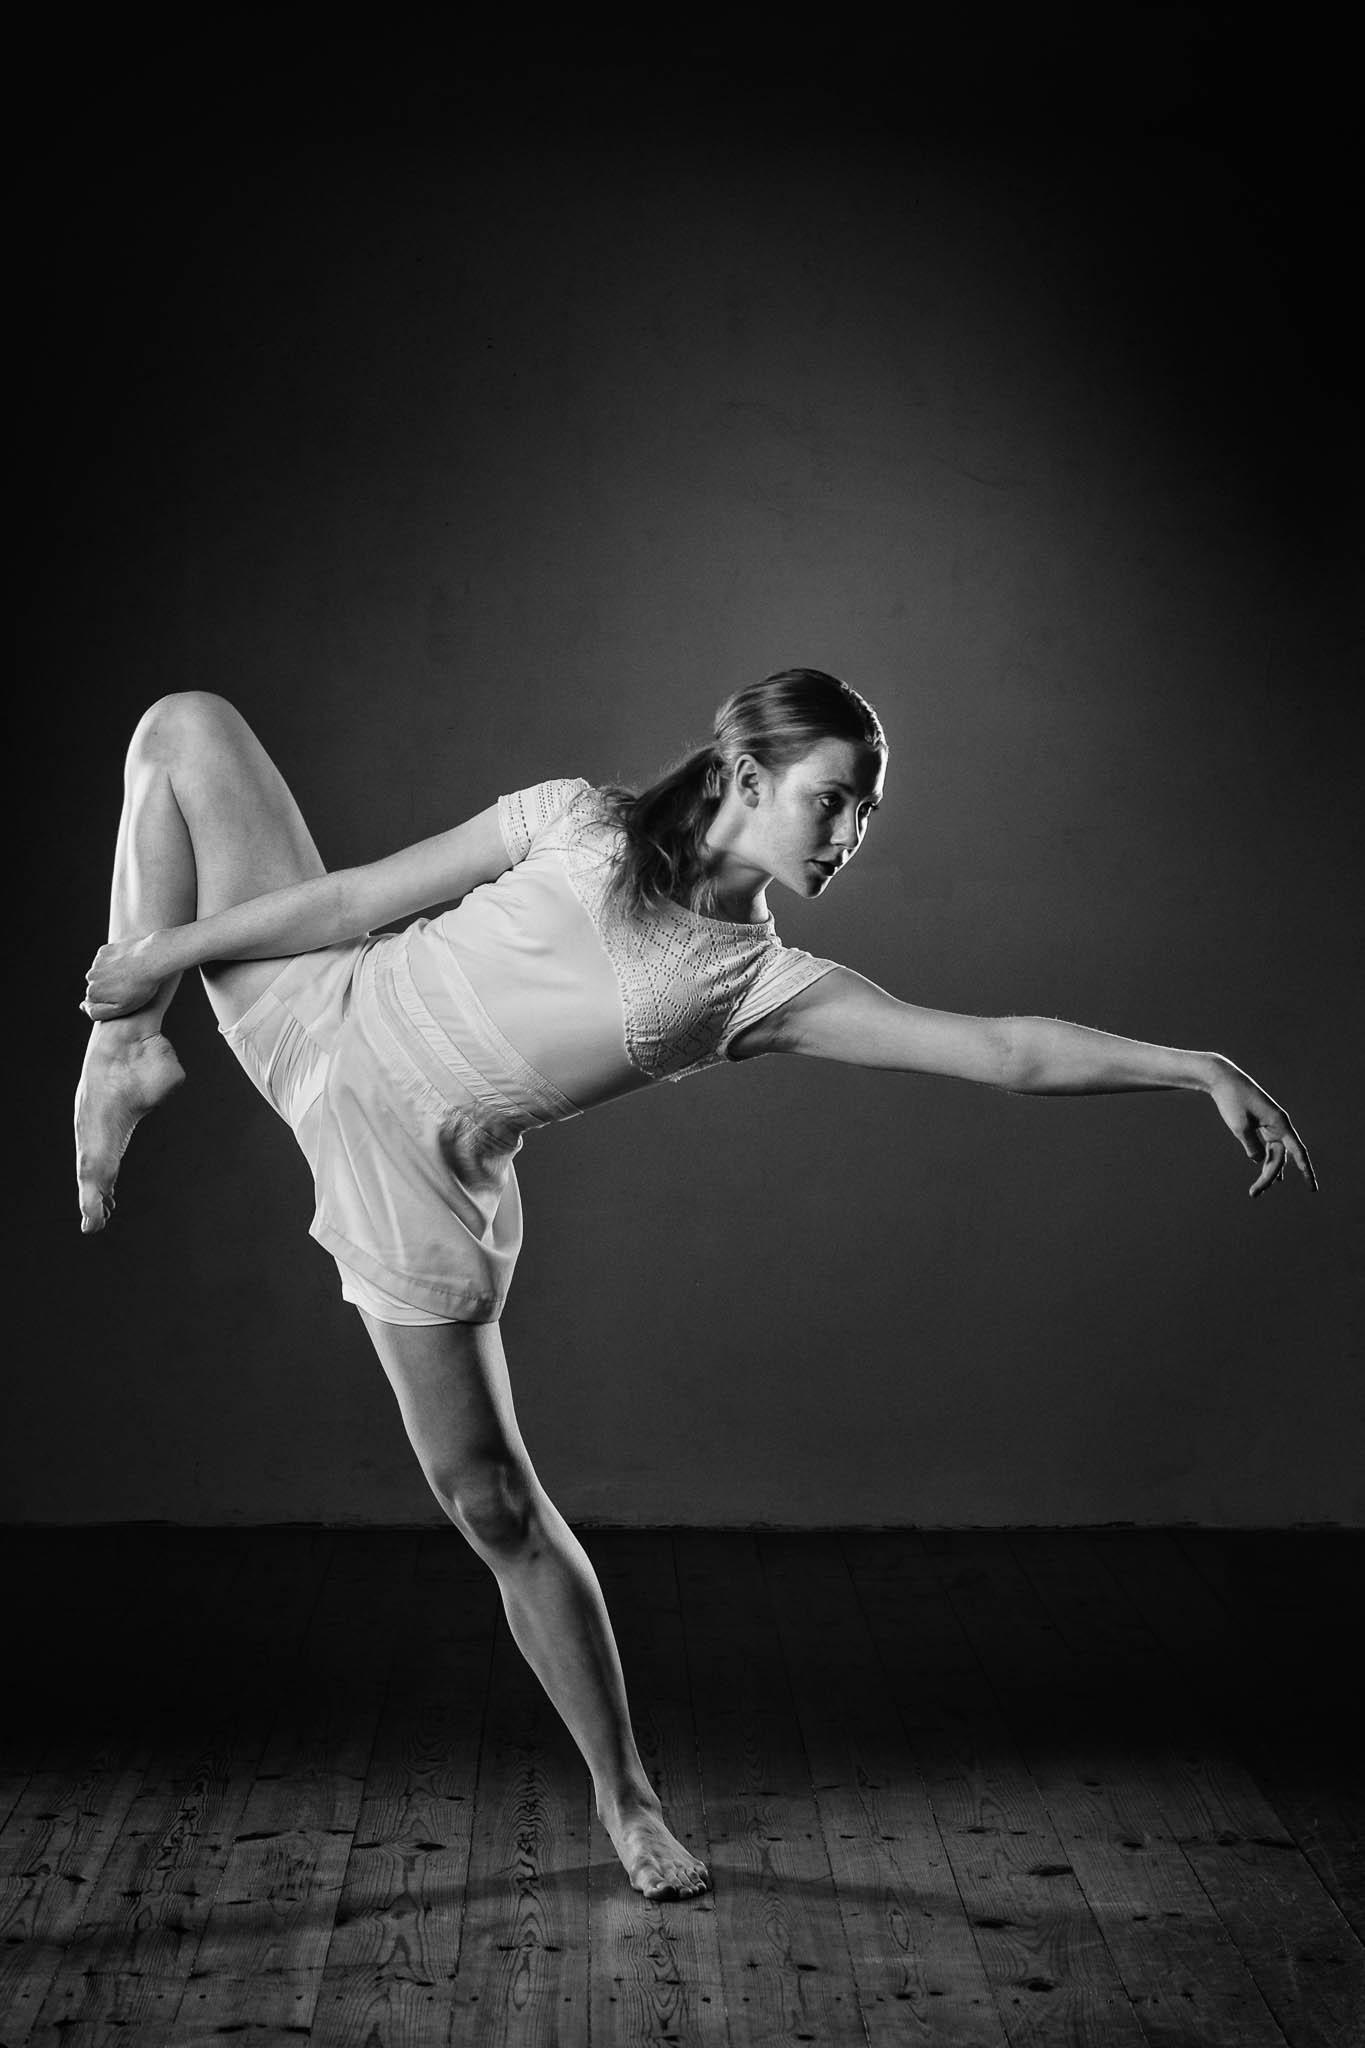 Astrid Tetsche Sweeney